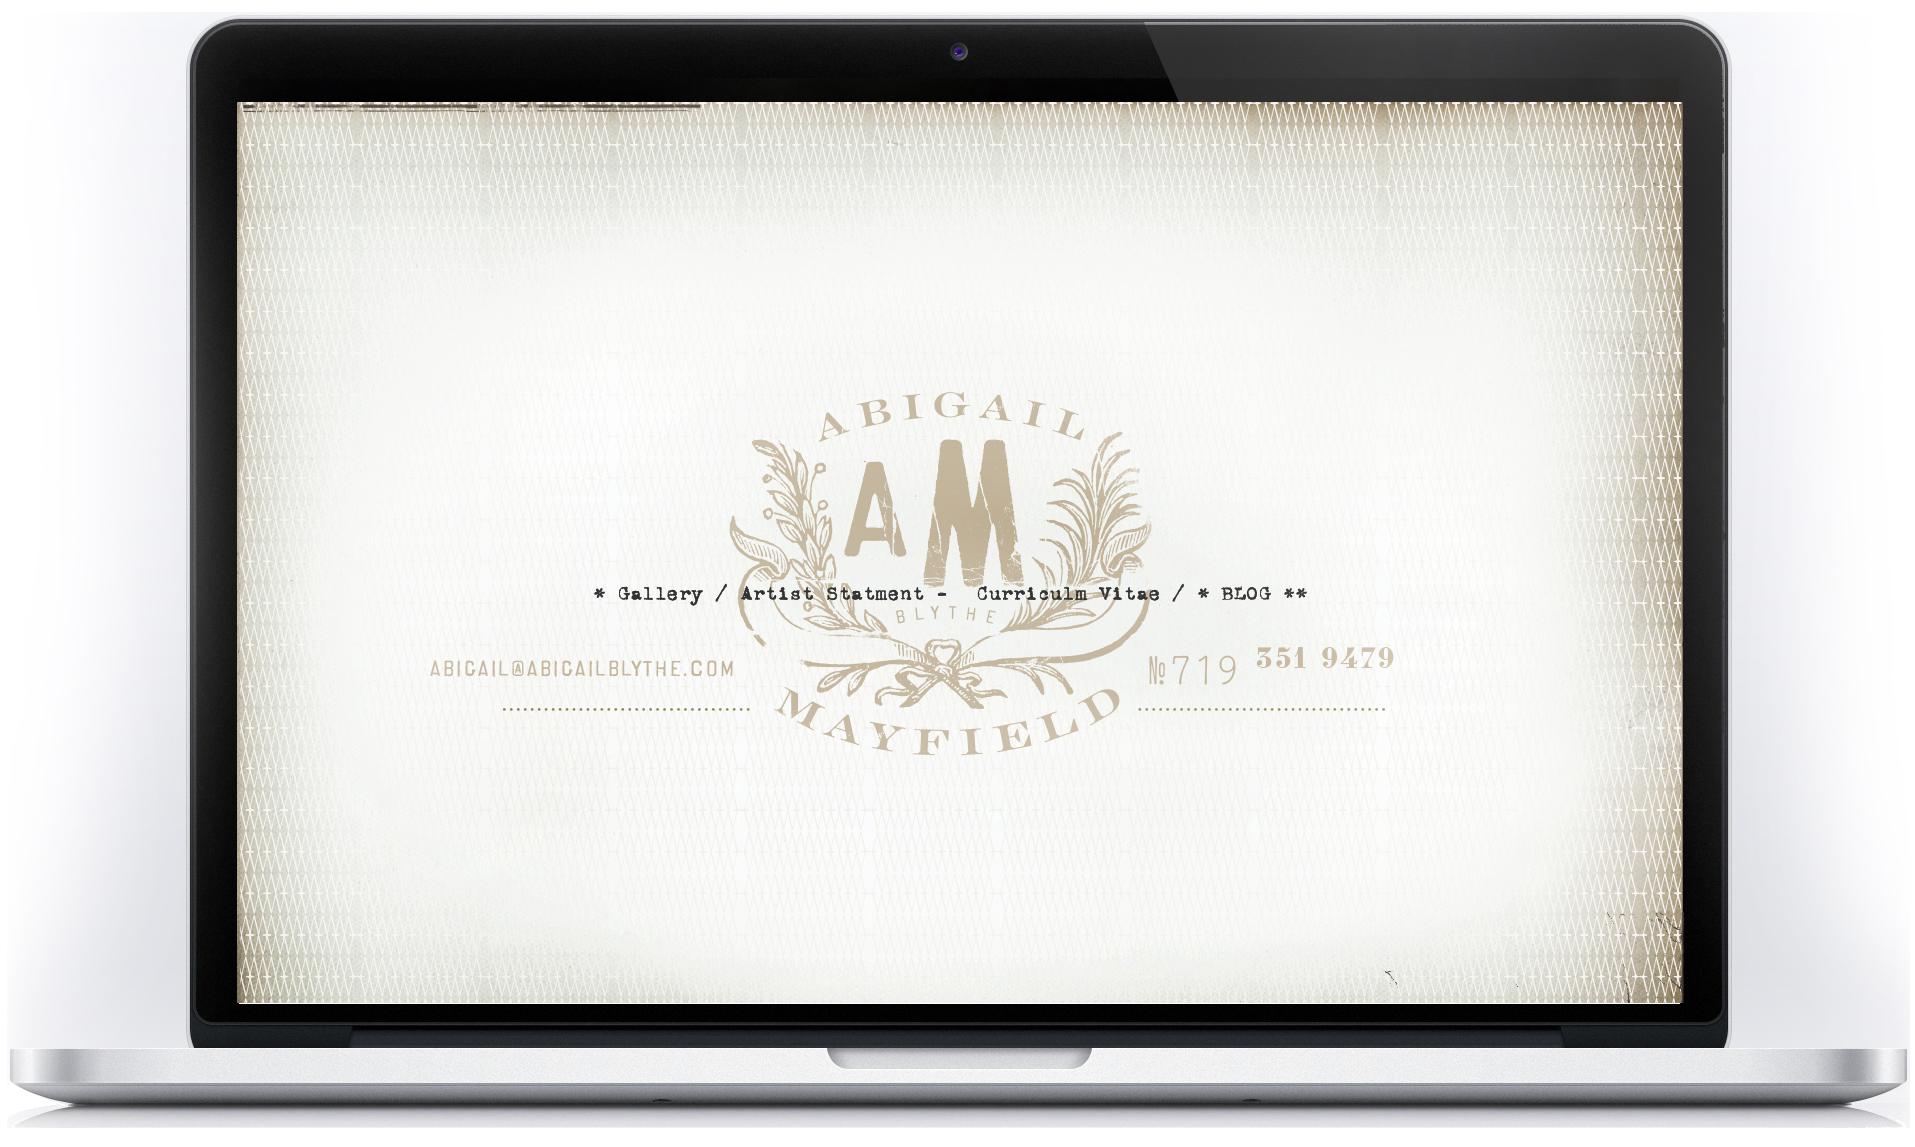 Abigail Mayfield _ Funnel.tv | Eric Kass